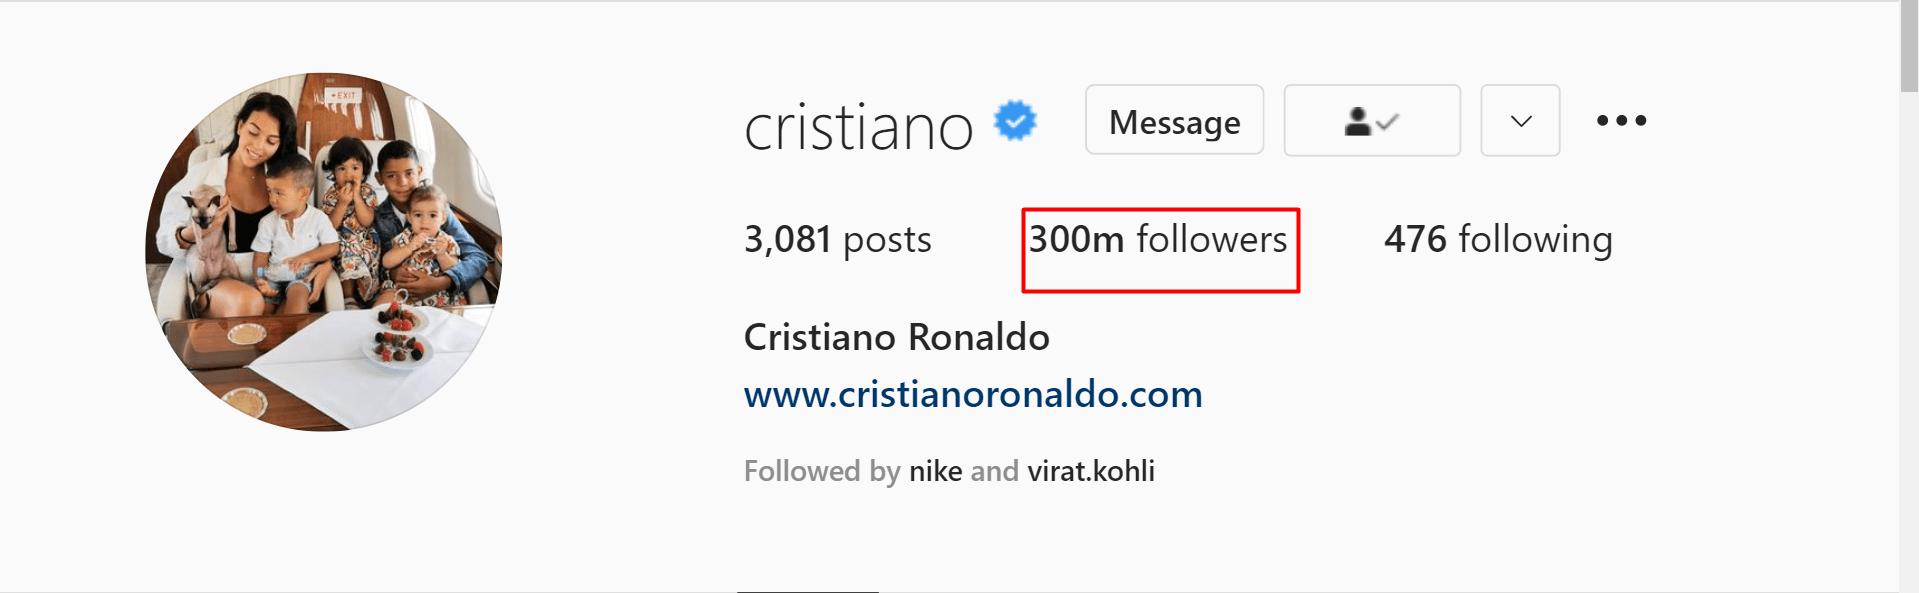 Cristiano Ronaldo Followers